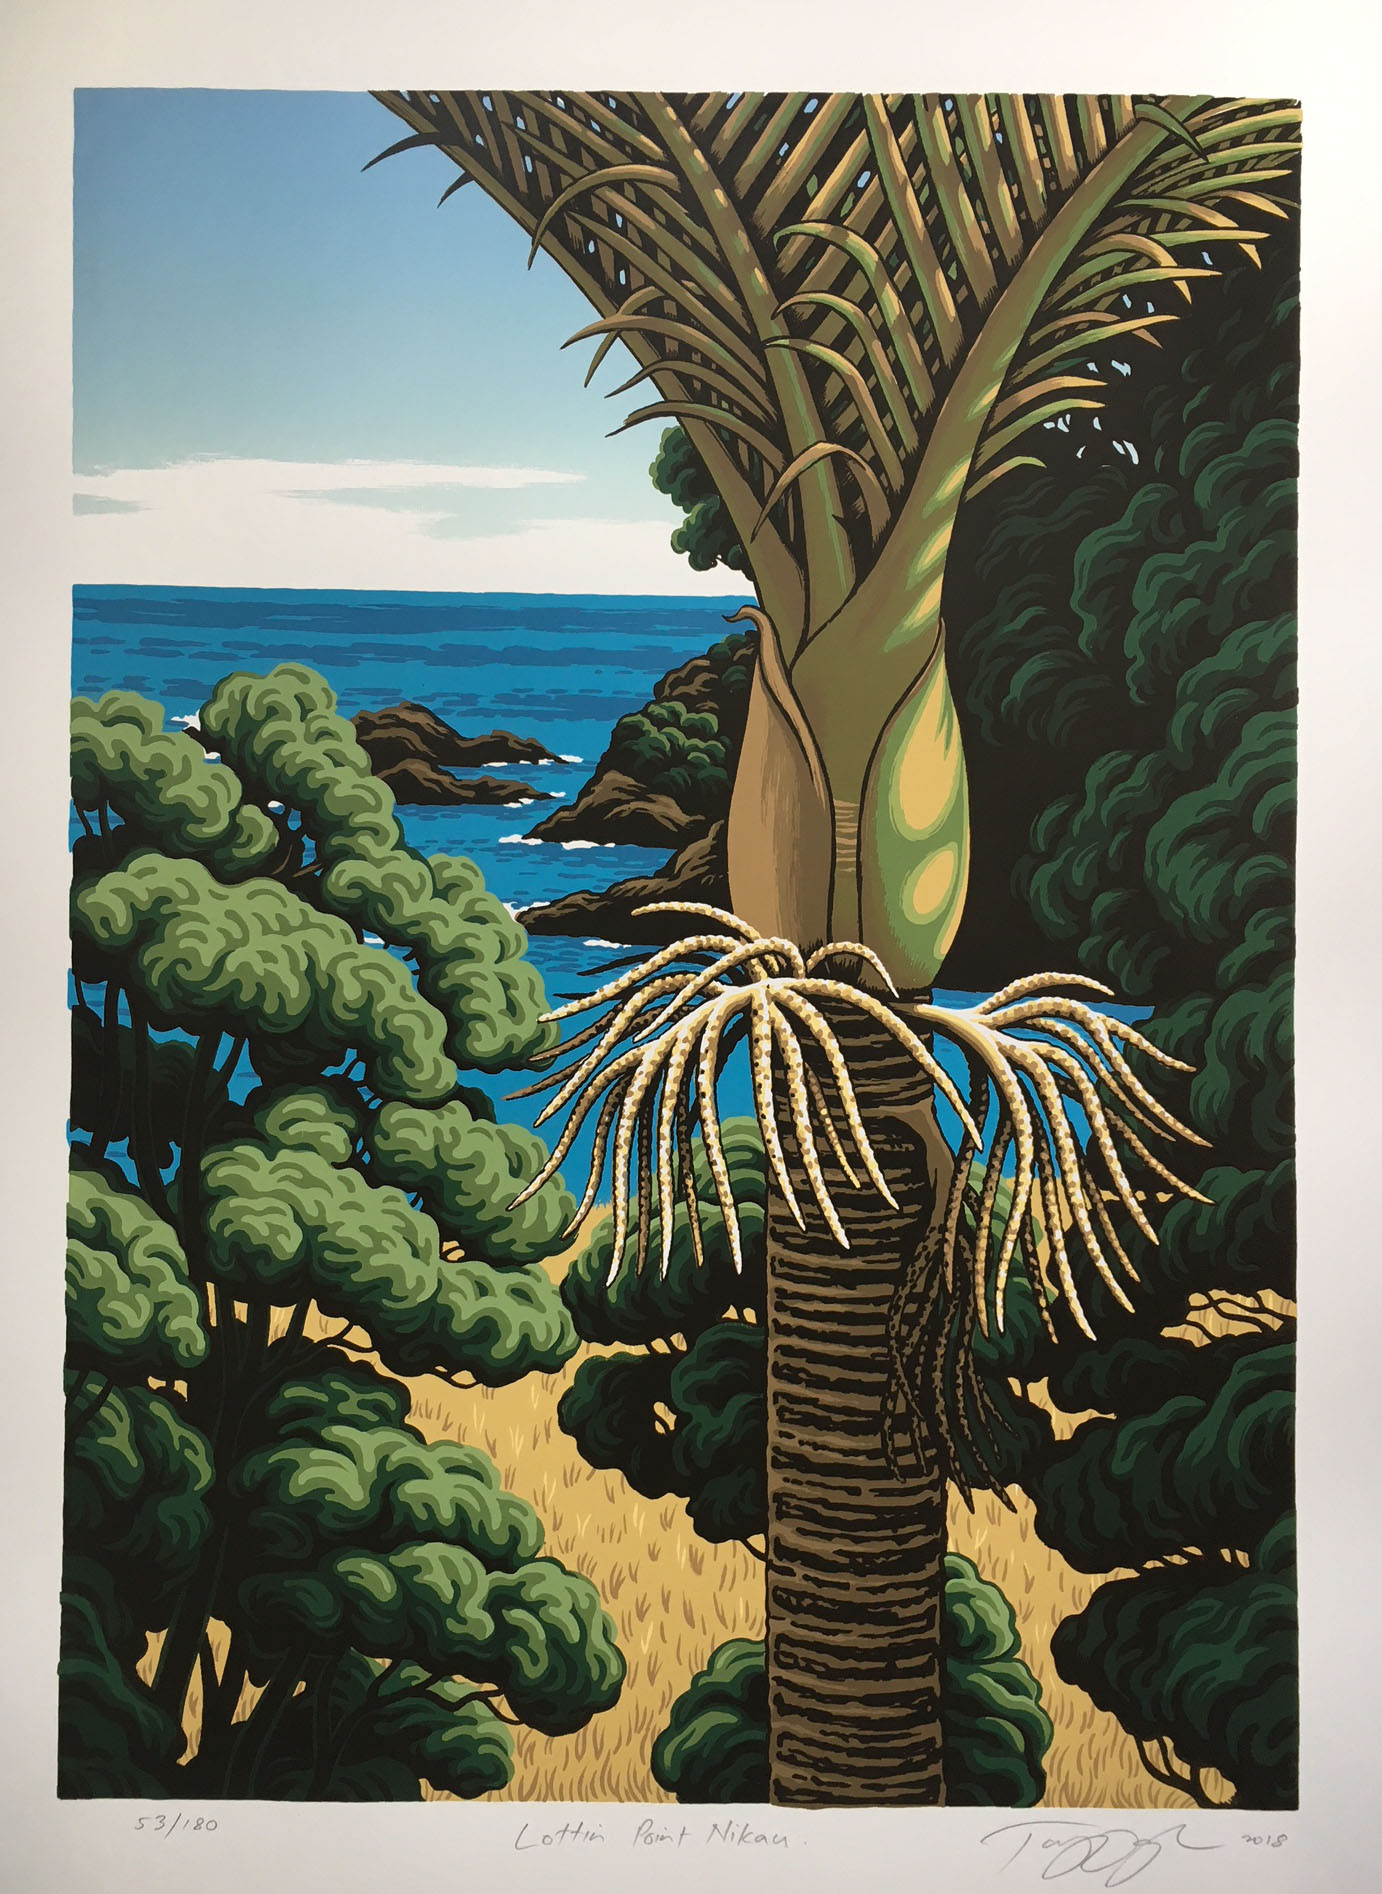 Lottin Point Nikau By Tony Ogle New Zealand Fine Prints